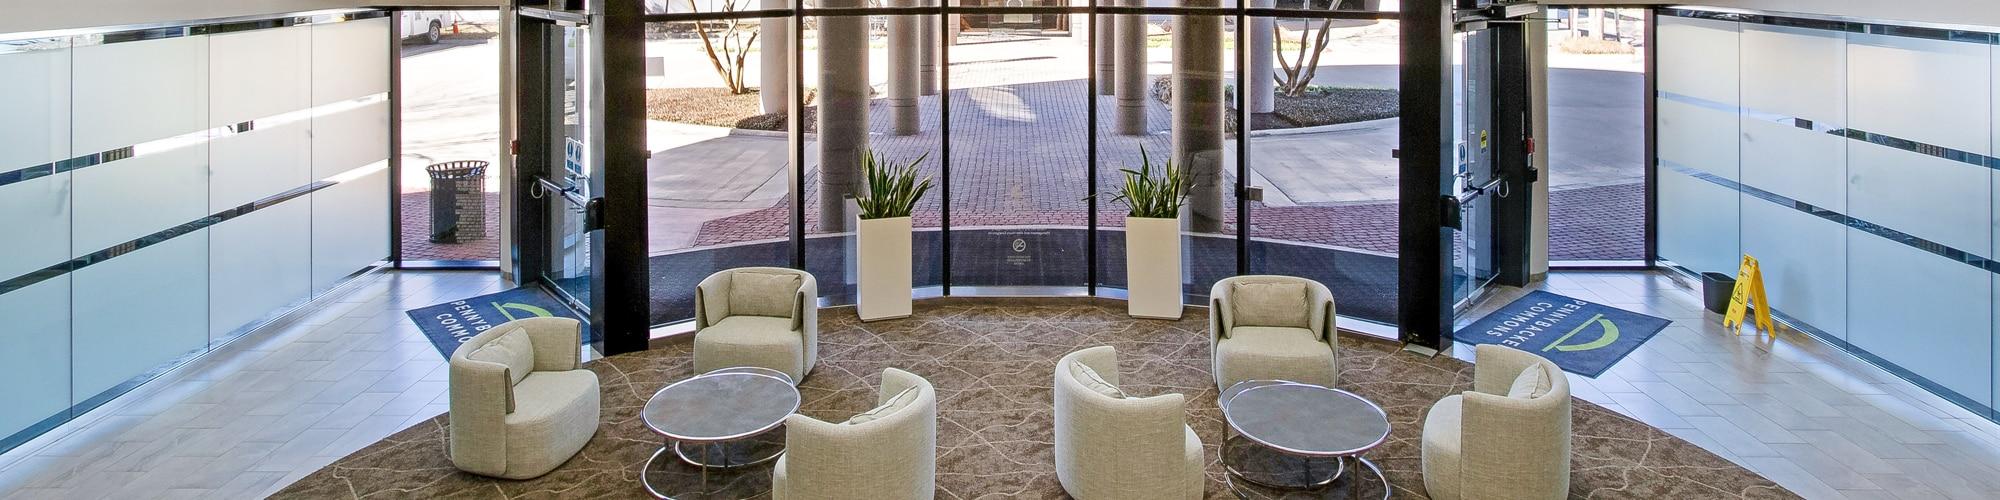 Pennybacker Commons Lobby